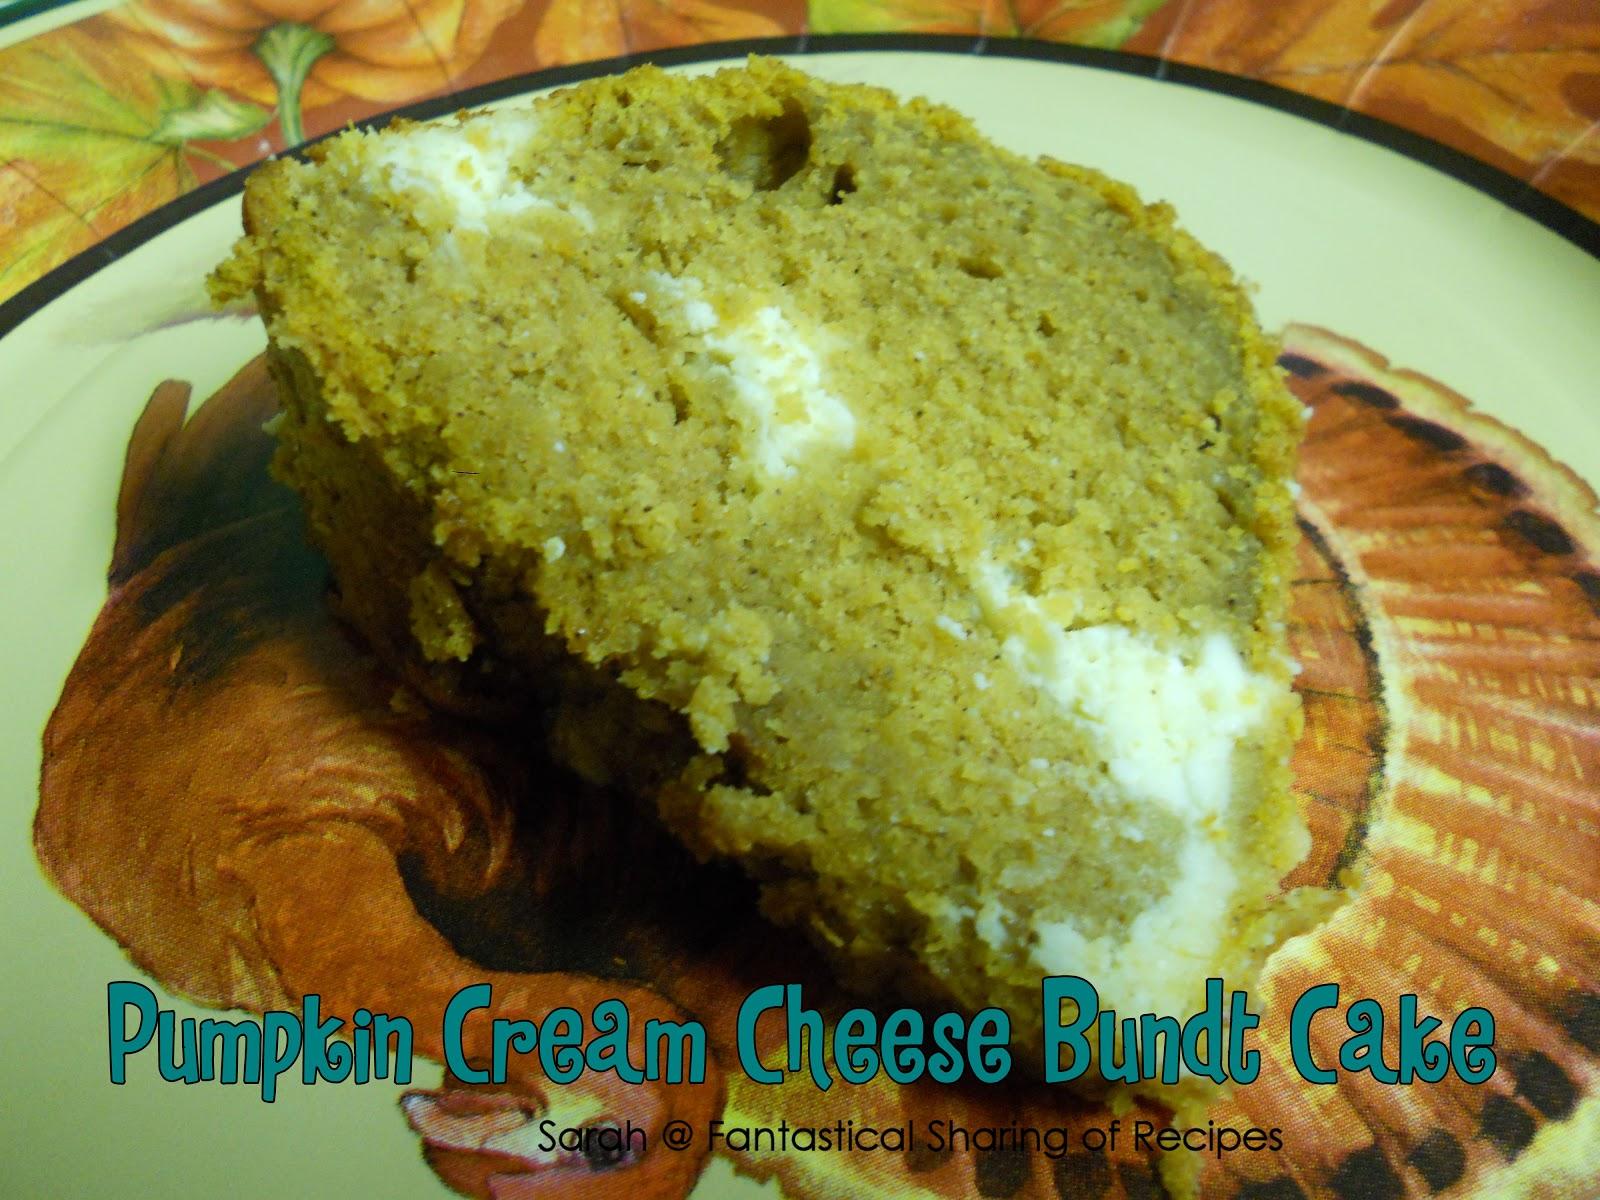 Fantastical Sharing of Recipes: Pumpkin Cream Cheese Bundt Cake